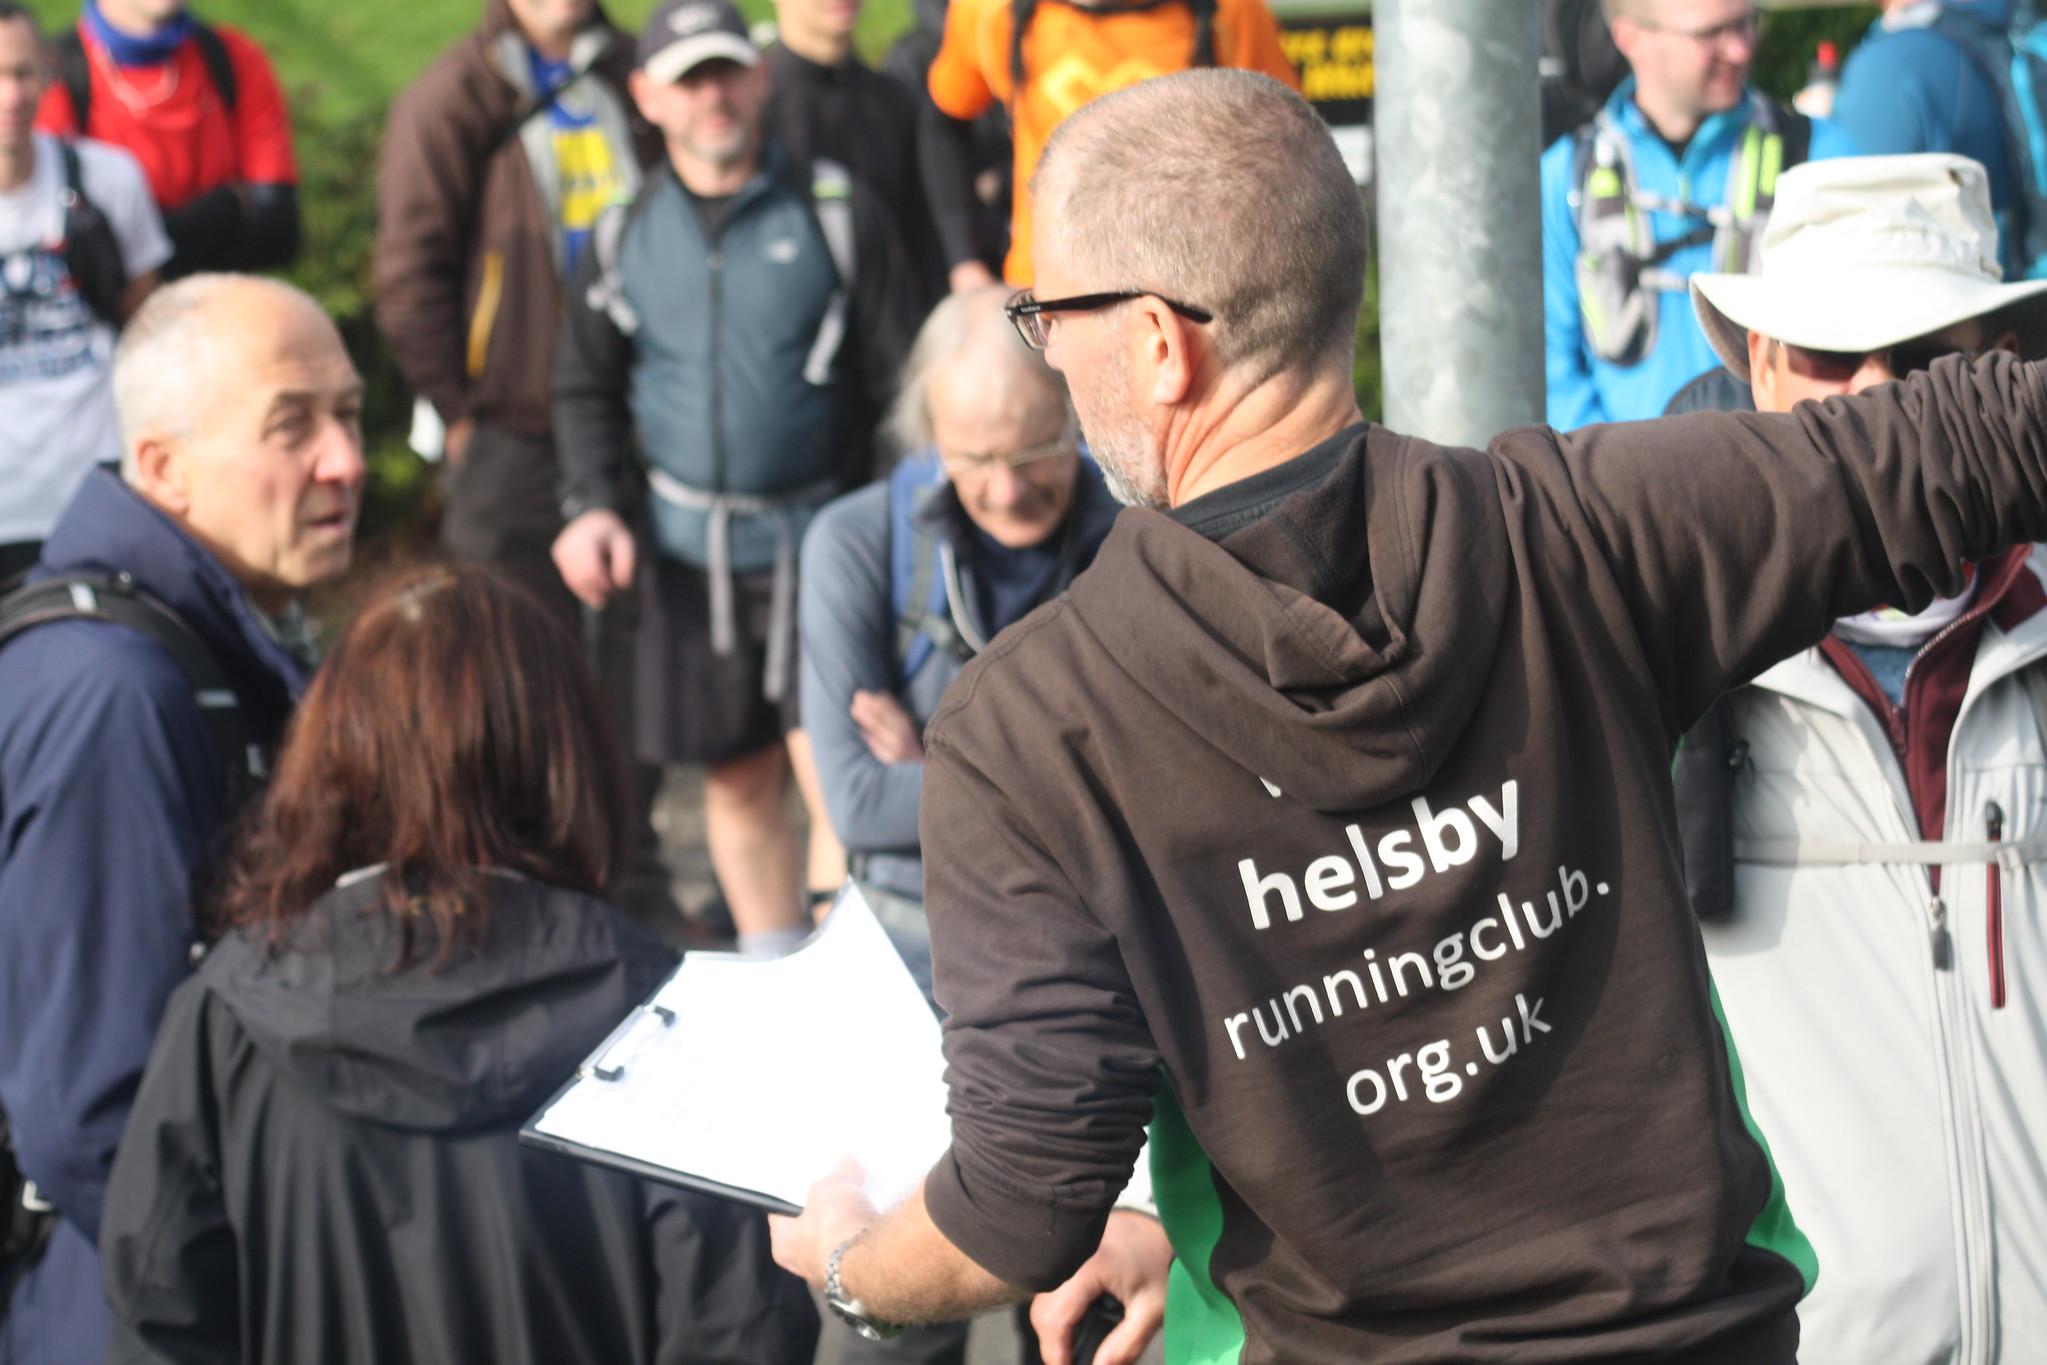 Helsby Running Club